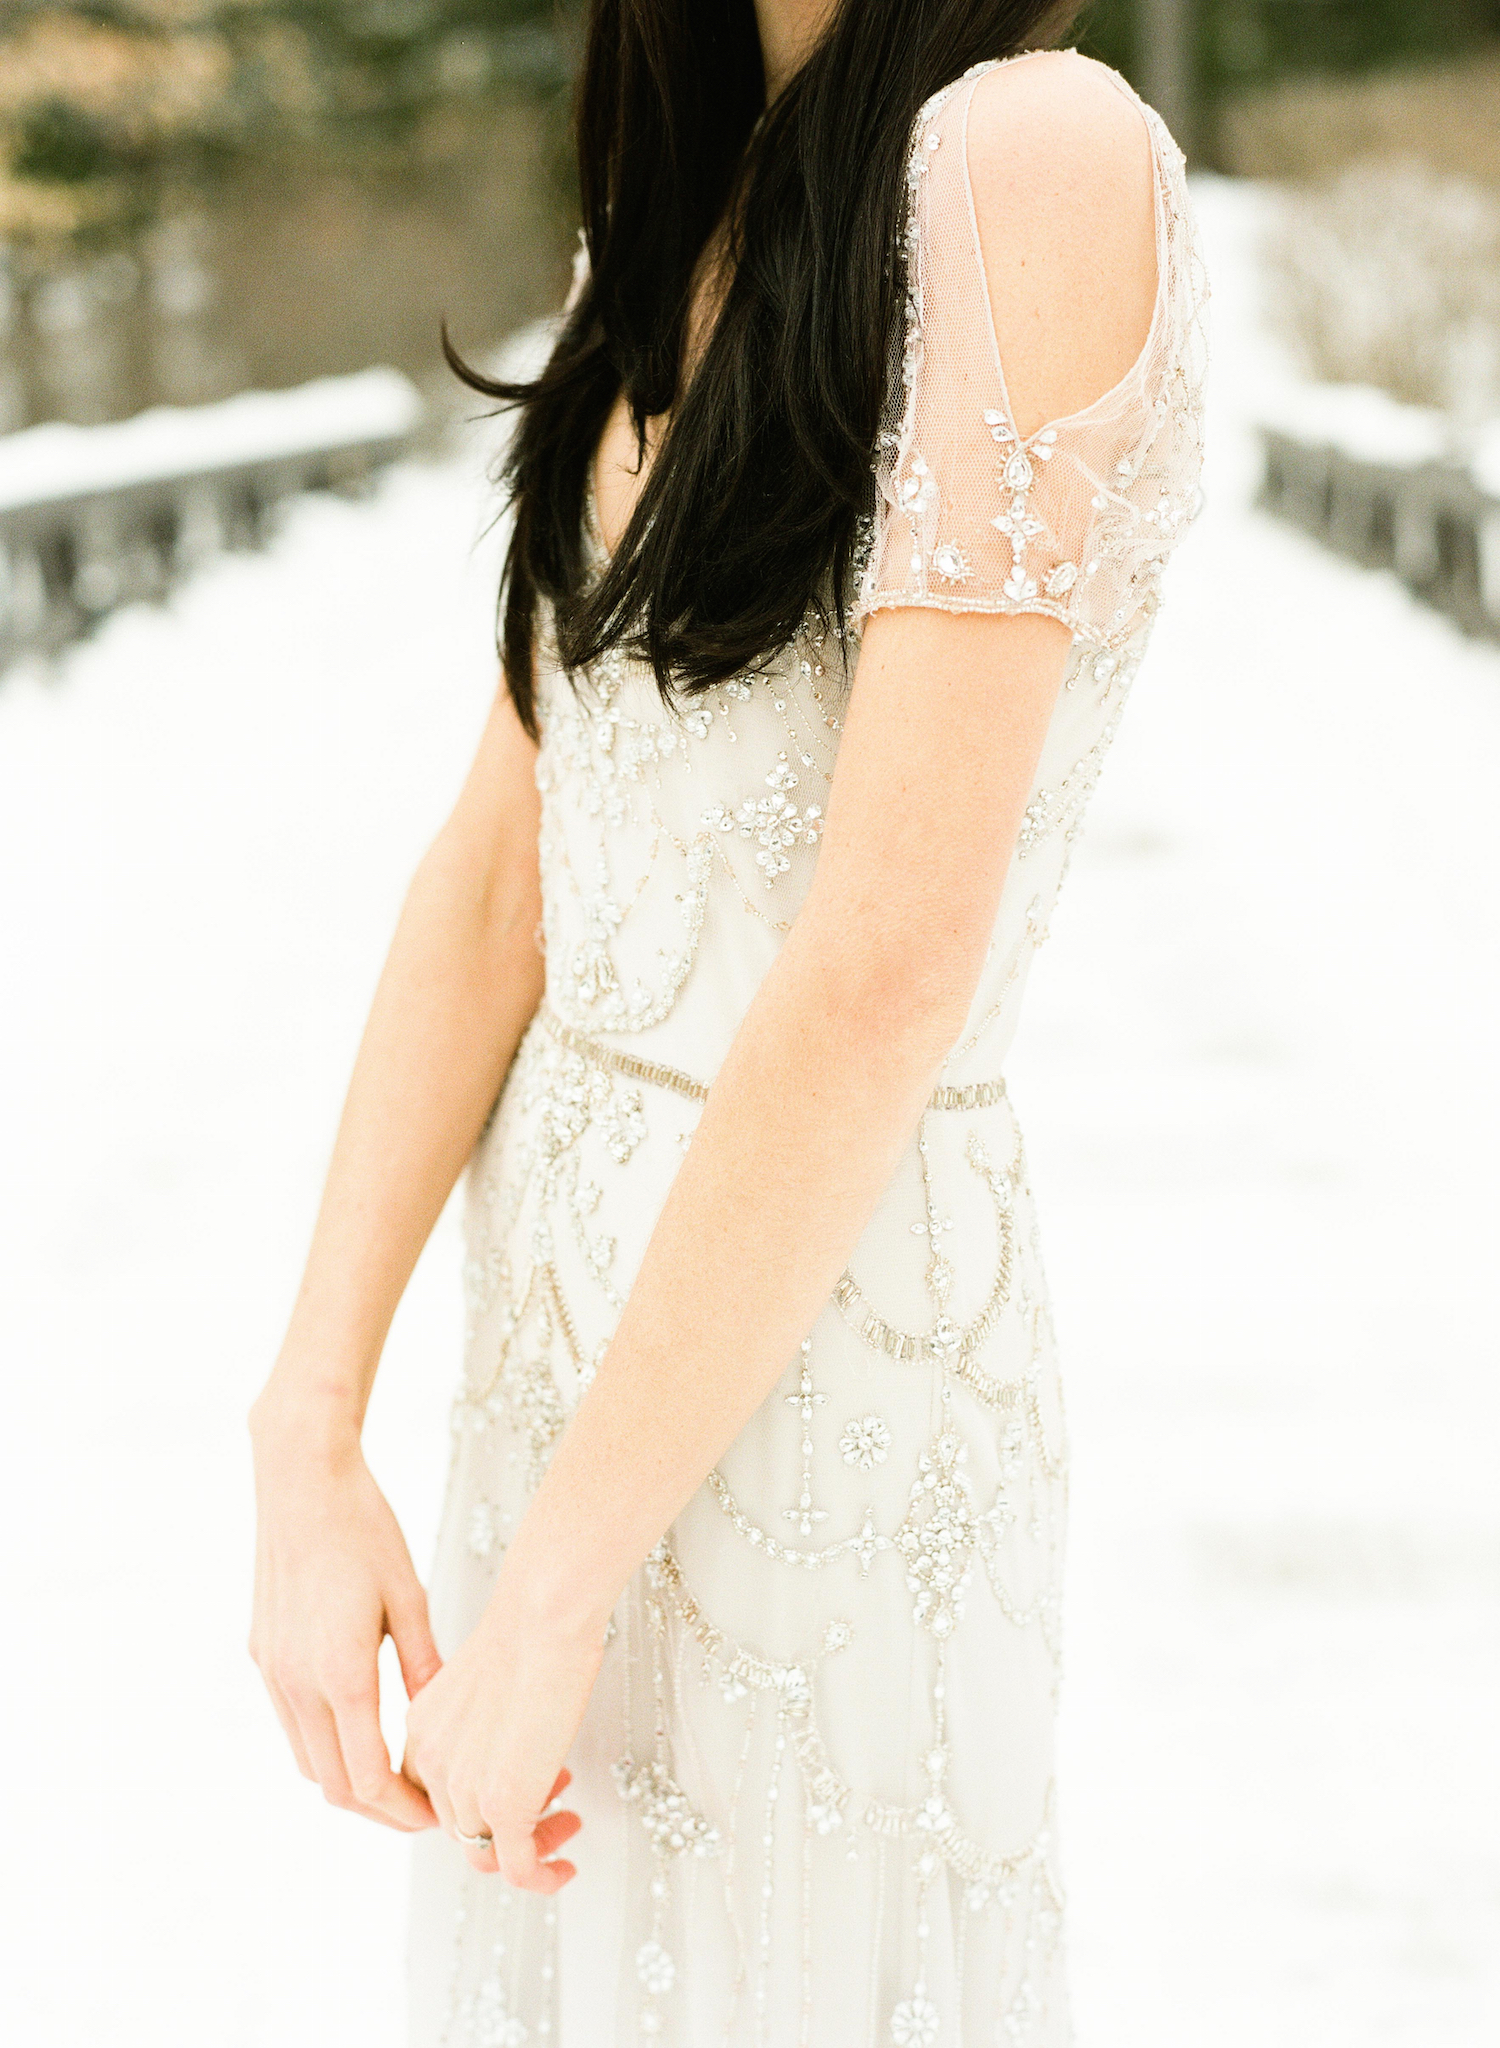 Winter Editorial-JennyPackham-LindsayMaddenPhotography-26 copy.jpg